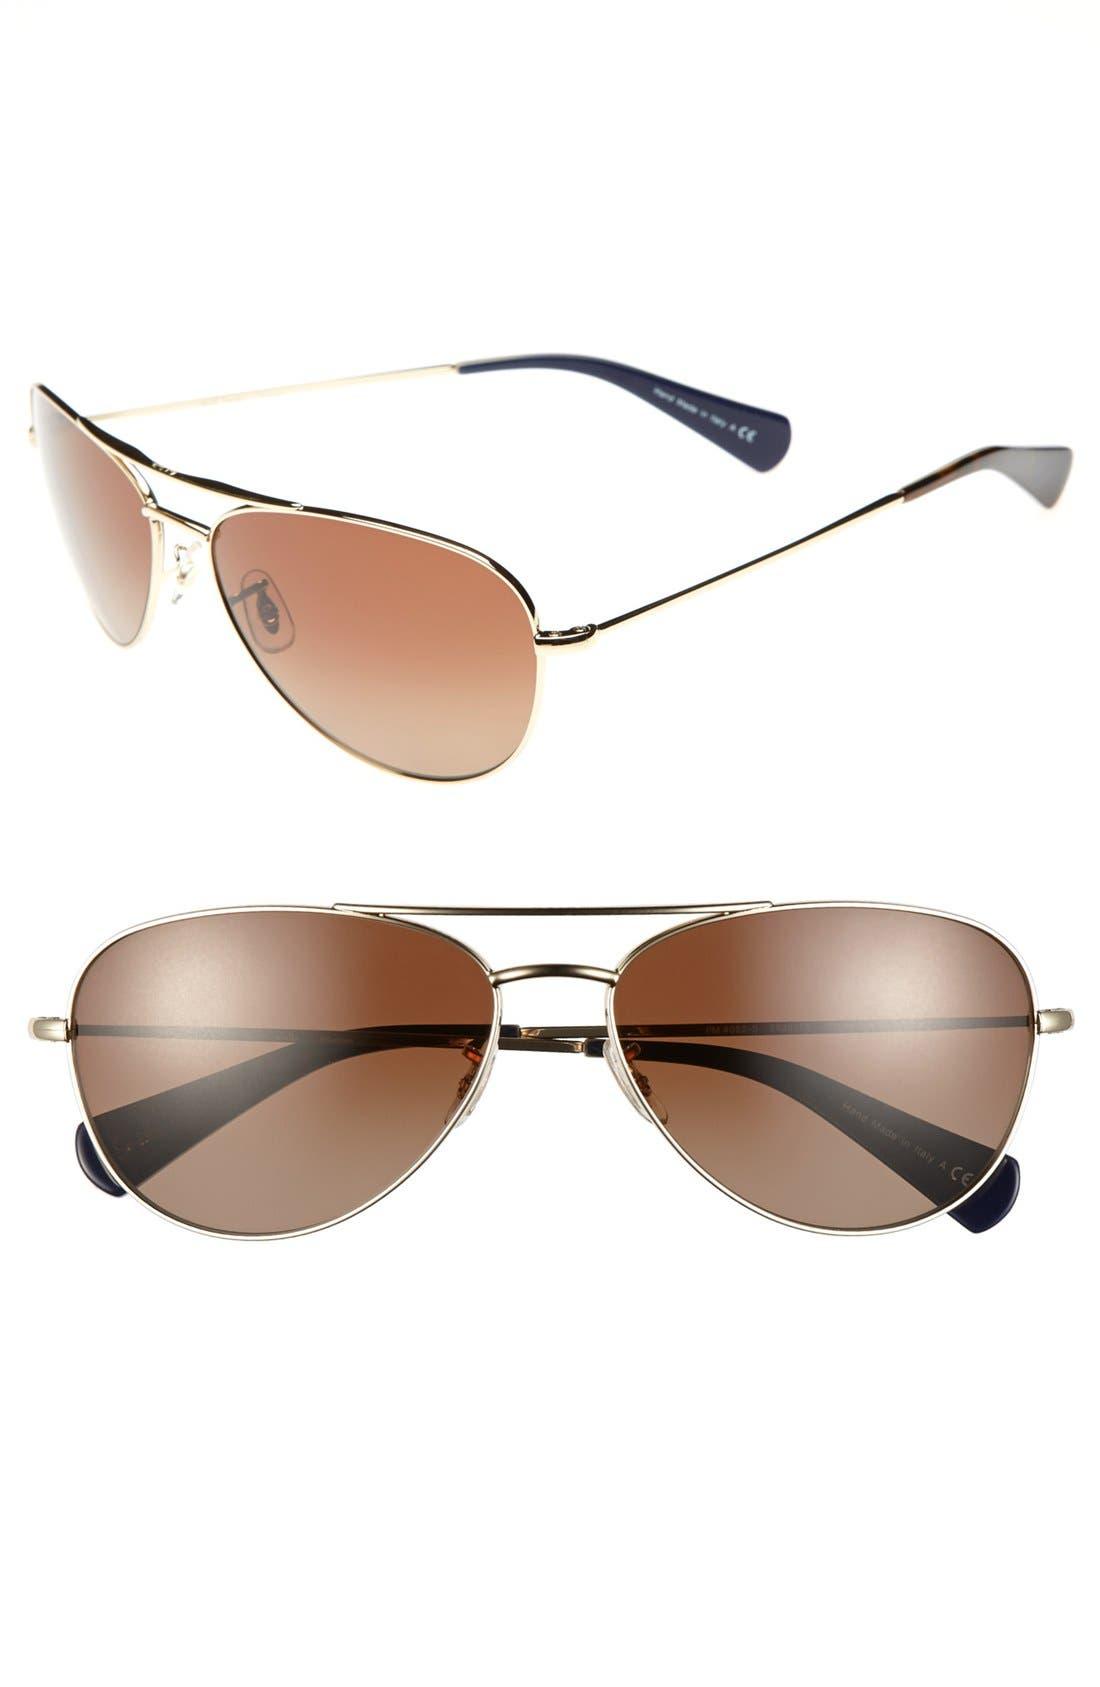 Main Image - Paul Smith 'Orsett' 61mm Polarized Sunglasses